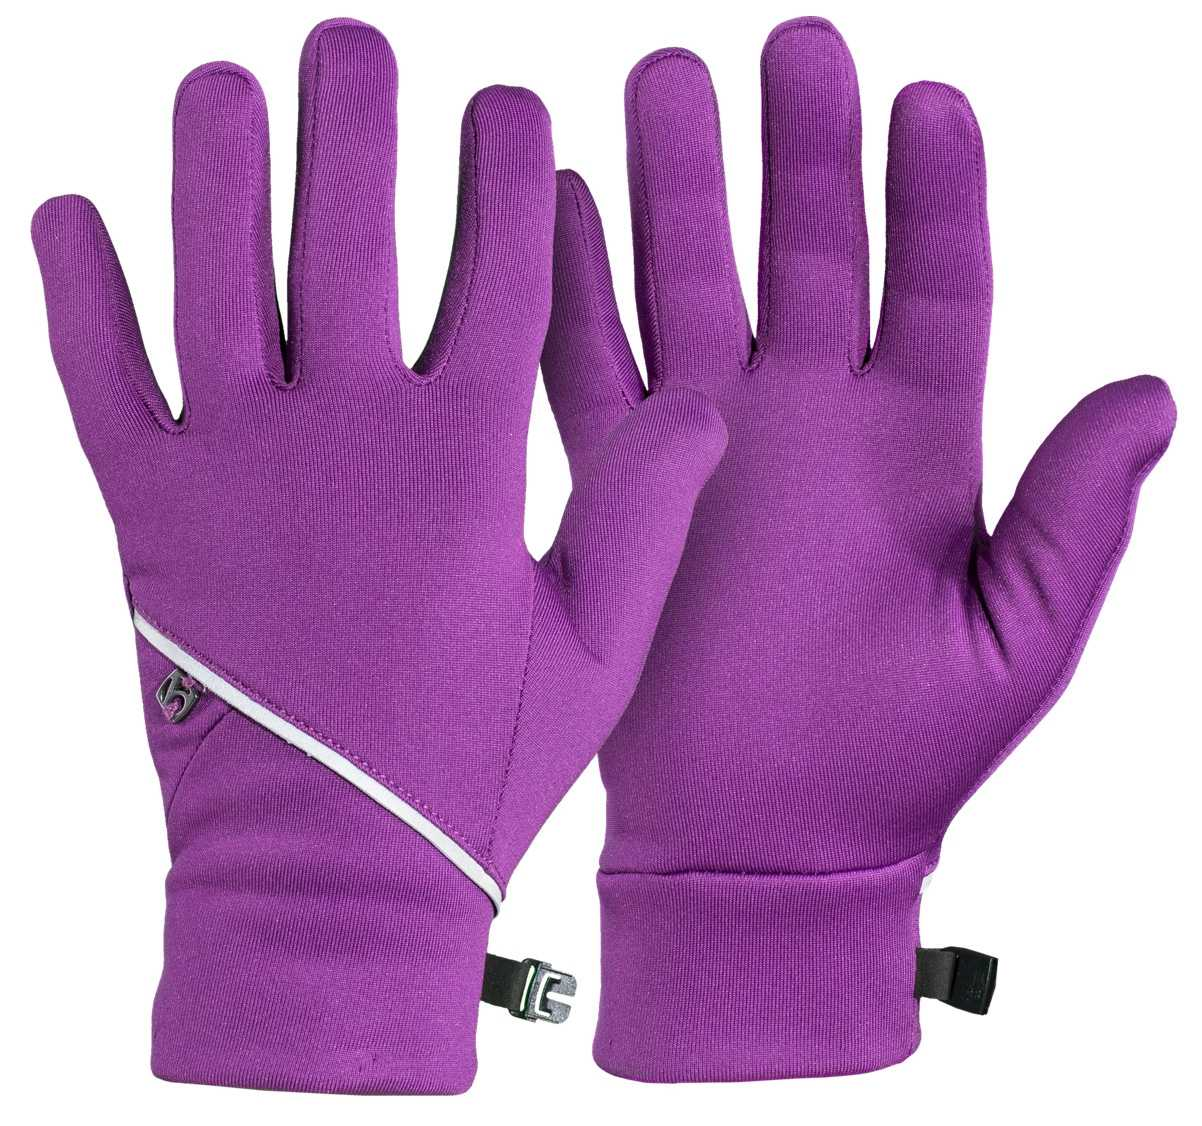 Handskar Bontrager Vella Thermal dam lila | Gloves